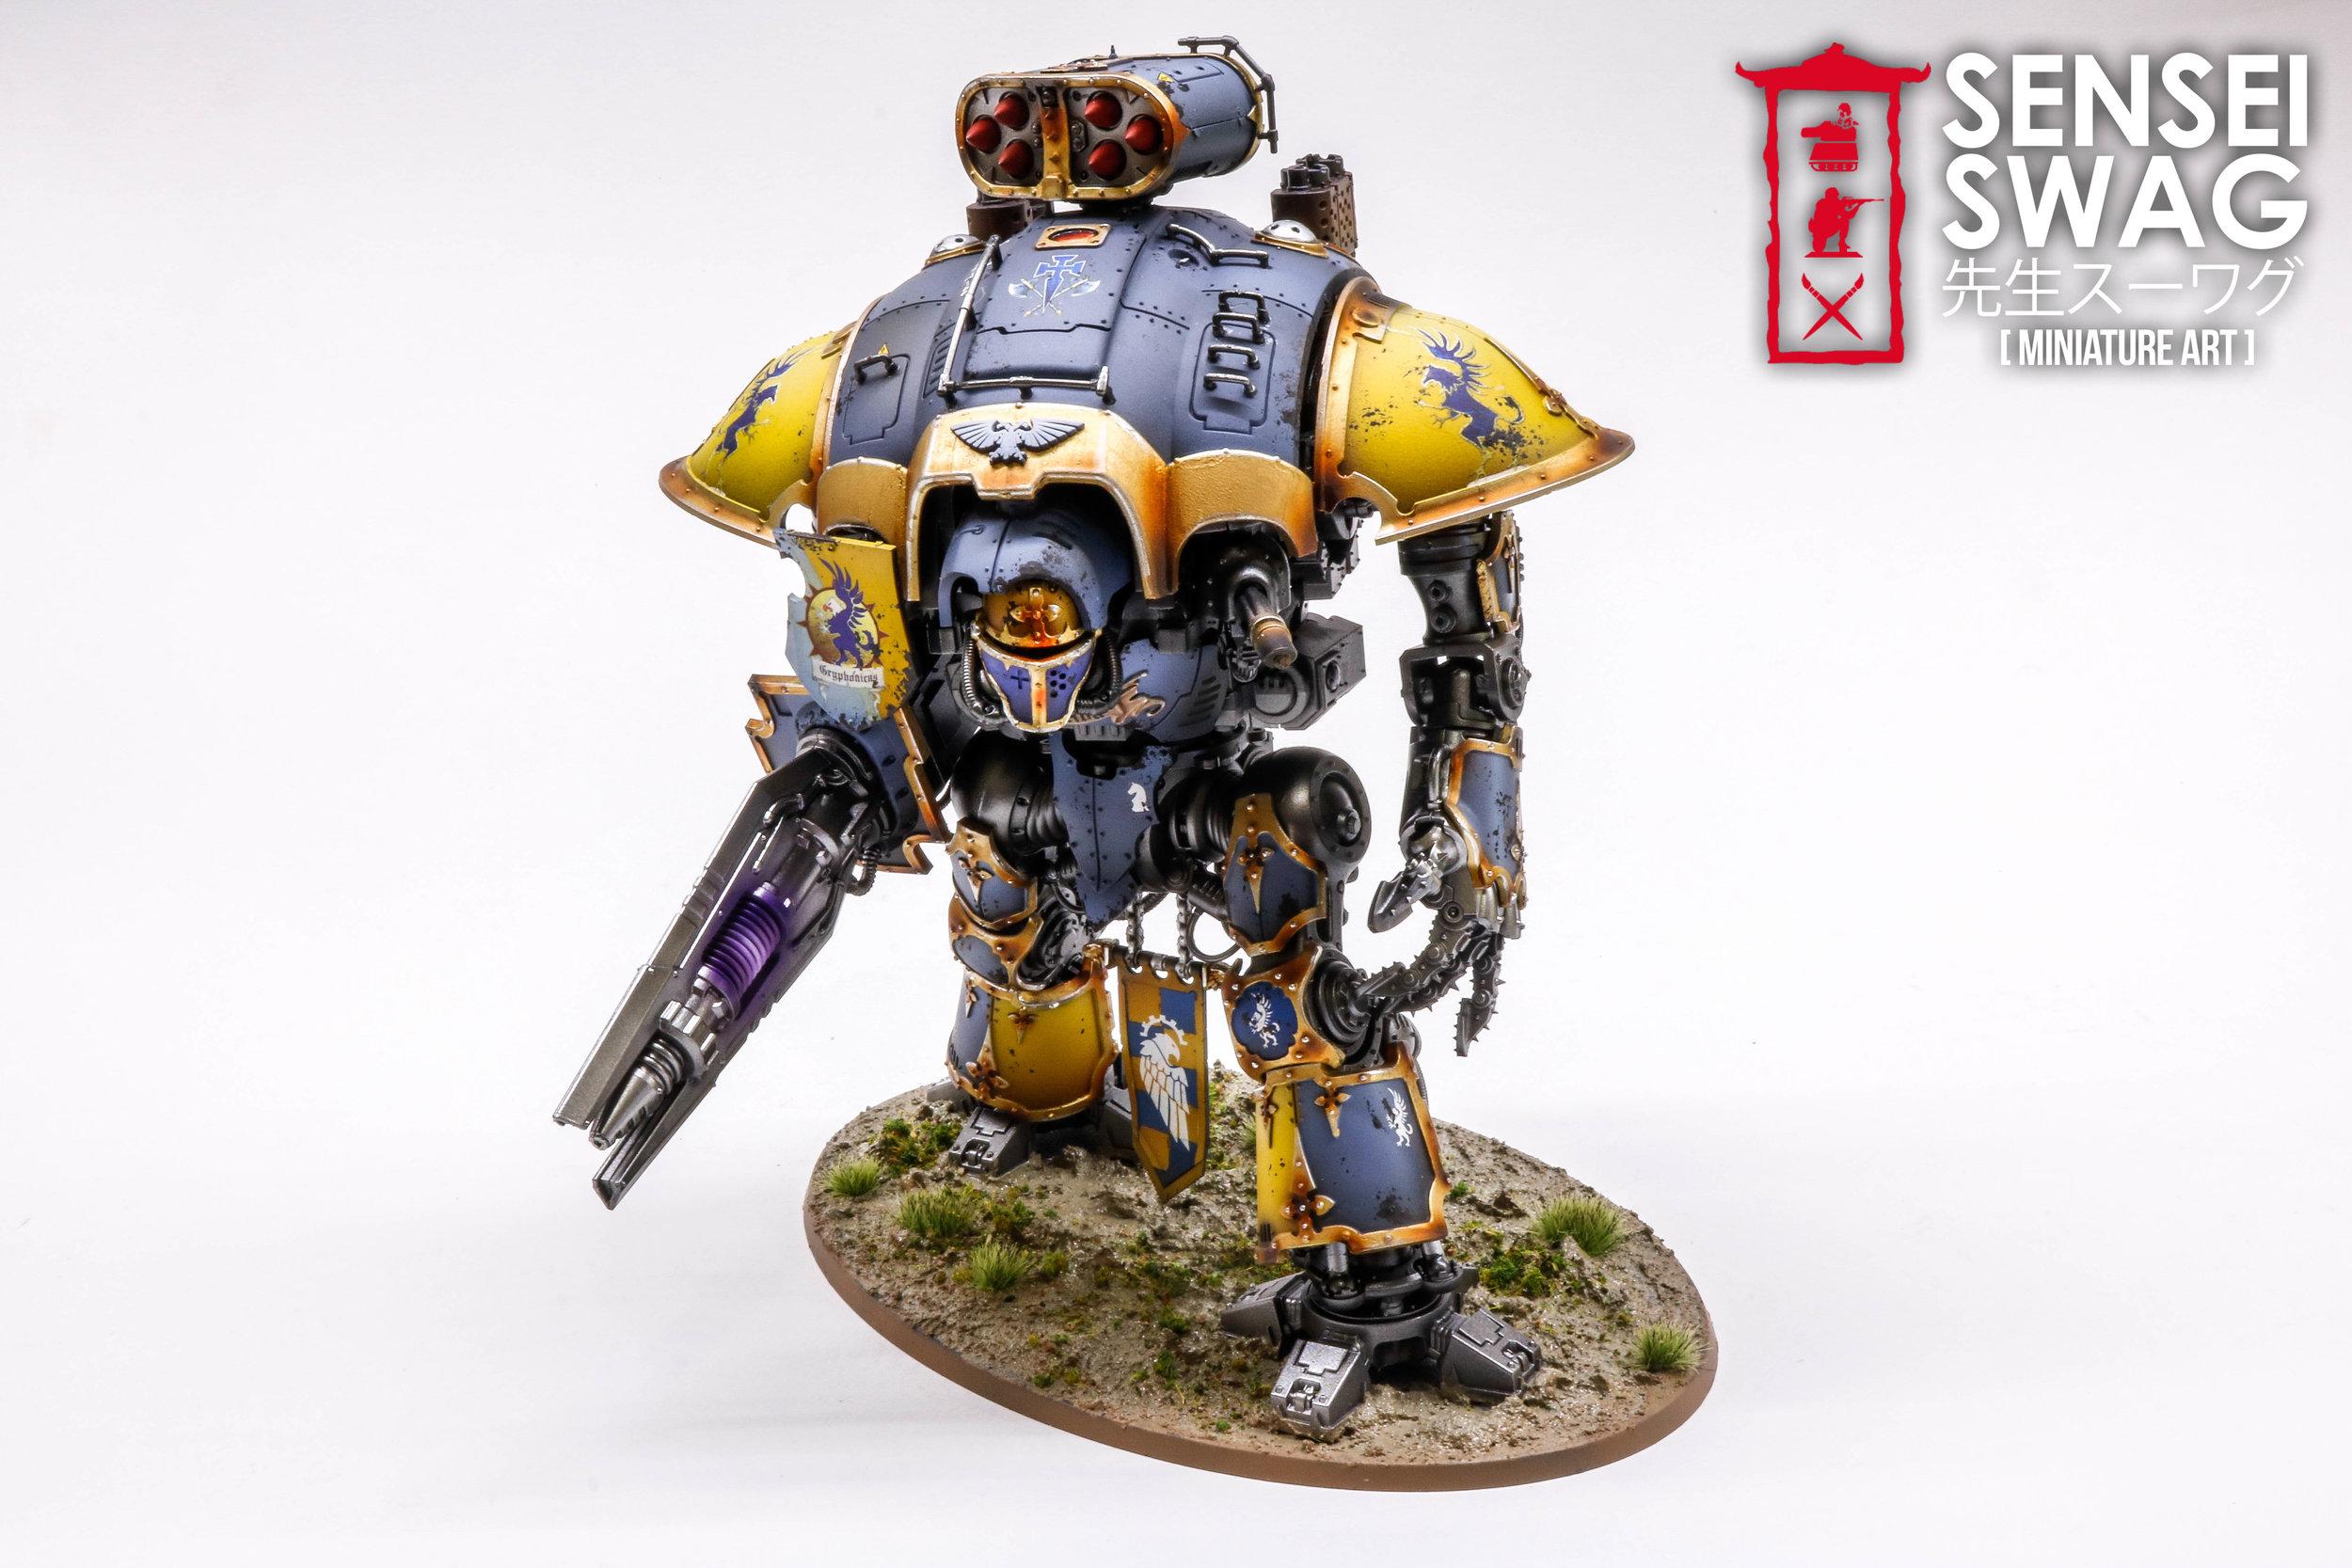 House Coldshroud Imperial Knight Valiant Legio Gryphonicus Armiger Warden Preceptor-3.jpg